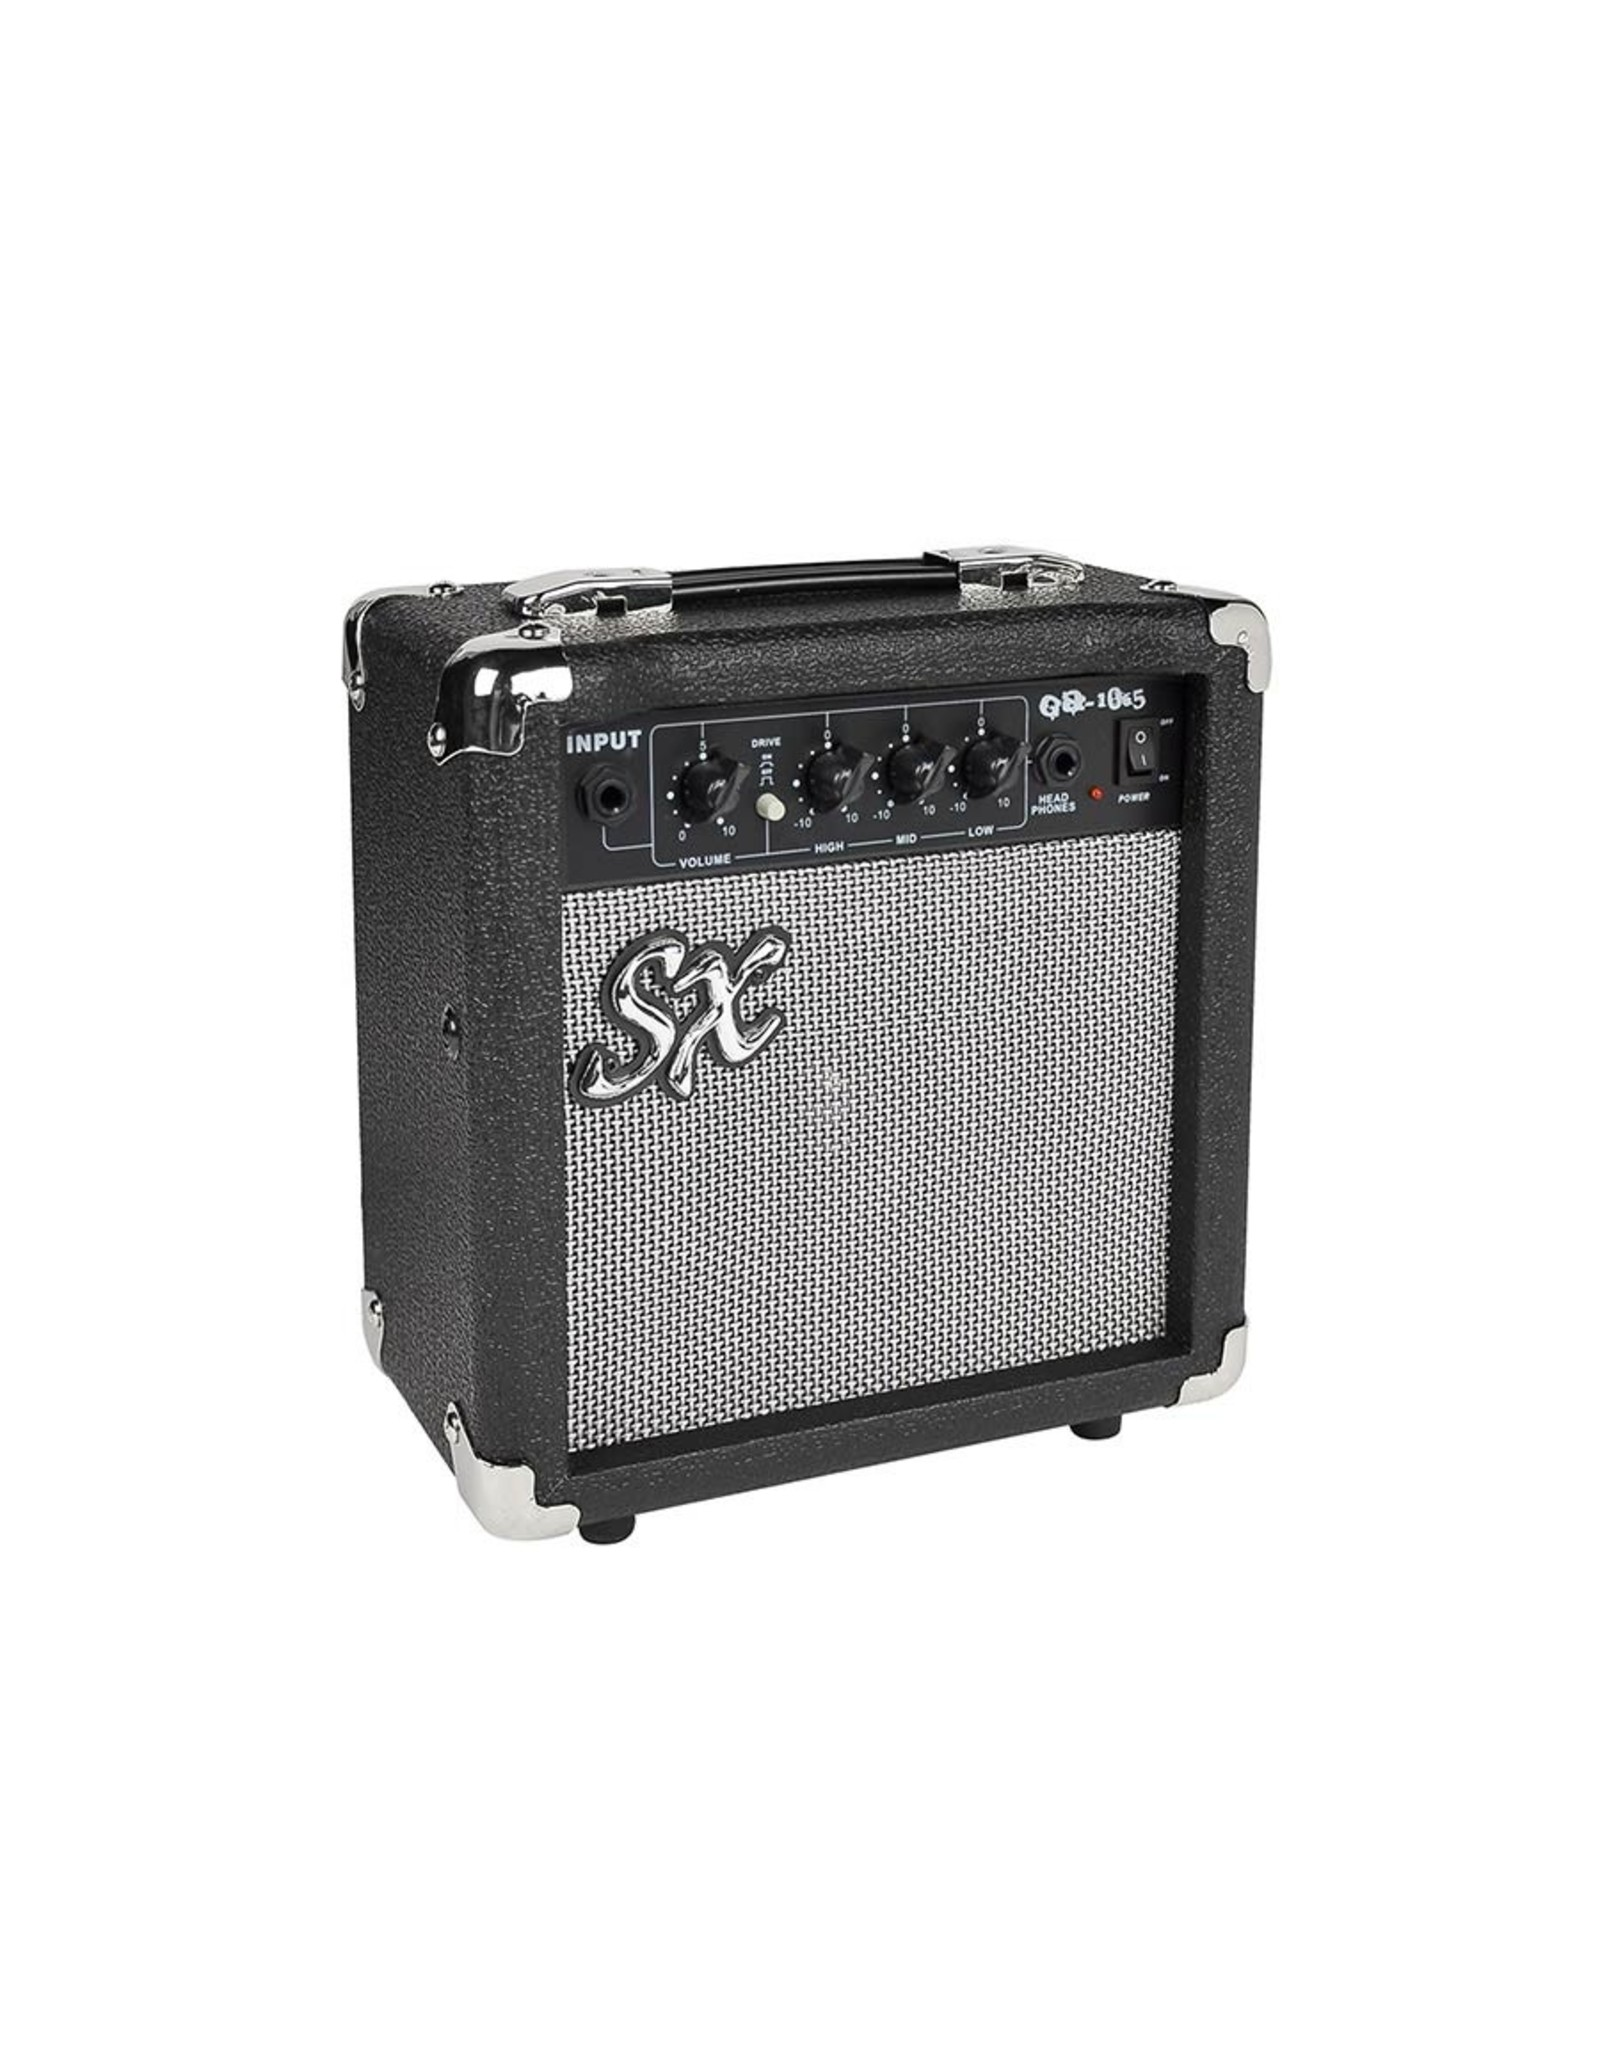 SX SX GA-1065 10 watt gitaarversterker